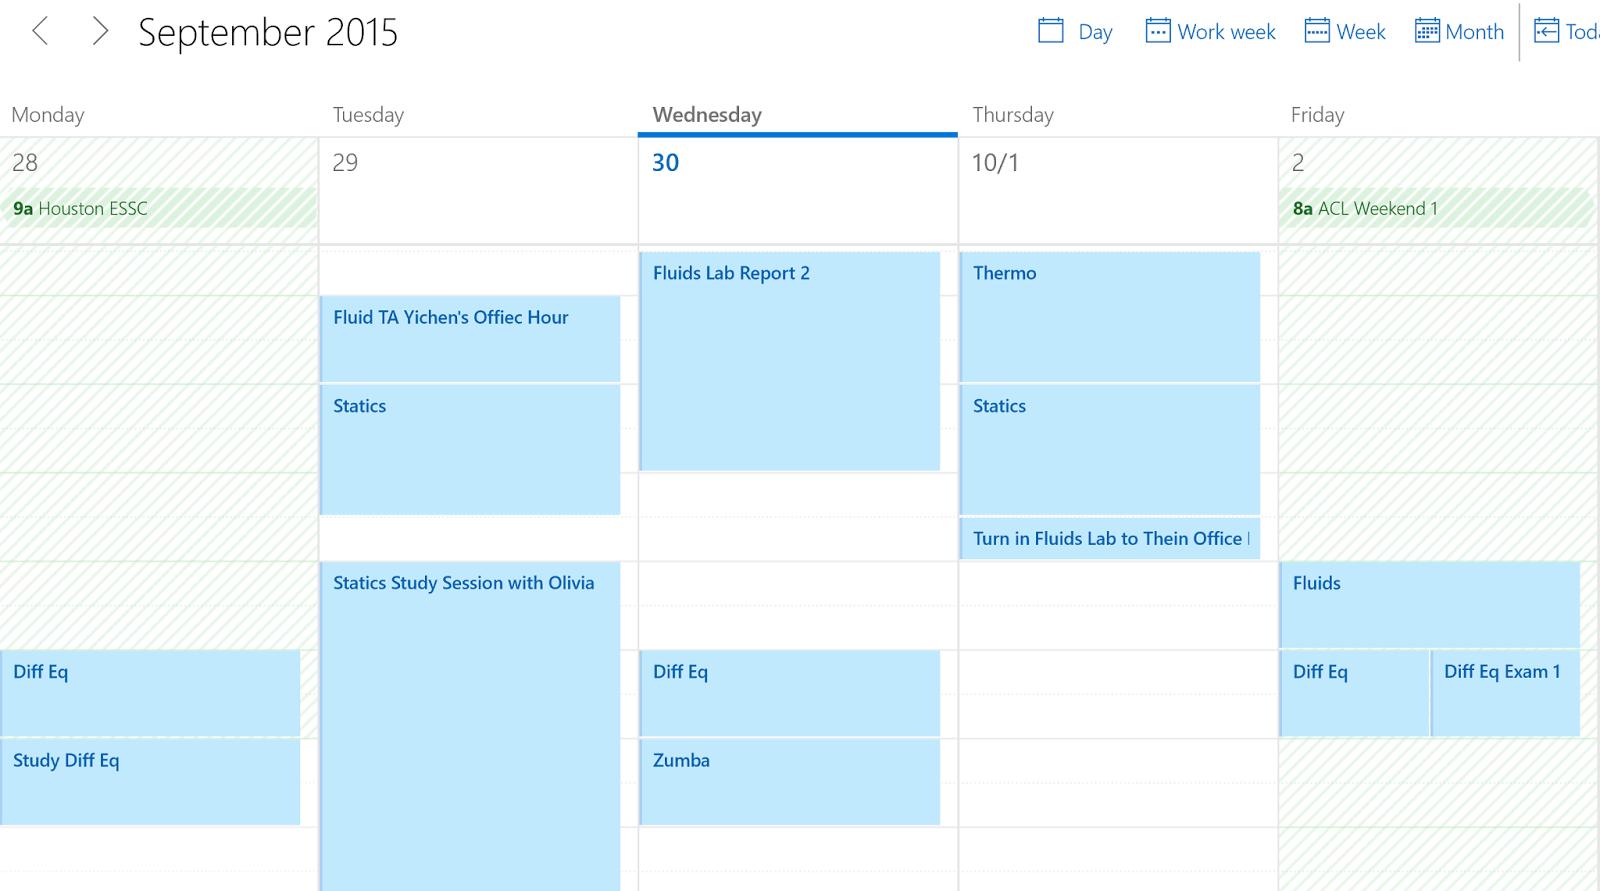 windows 10 google calendar schedule